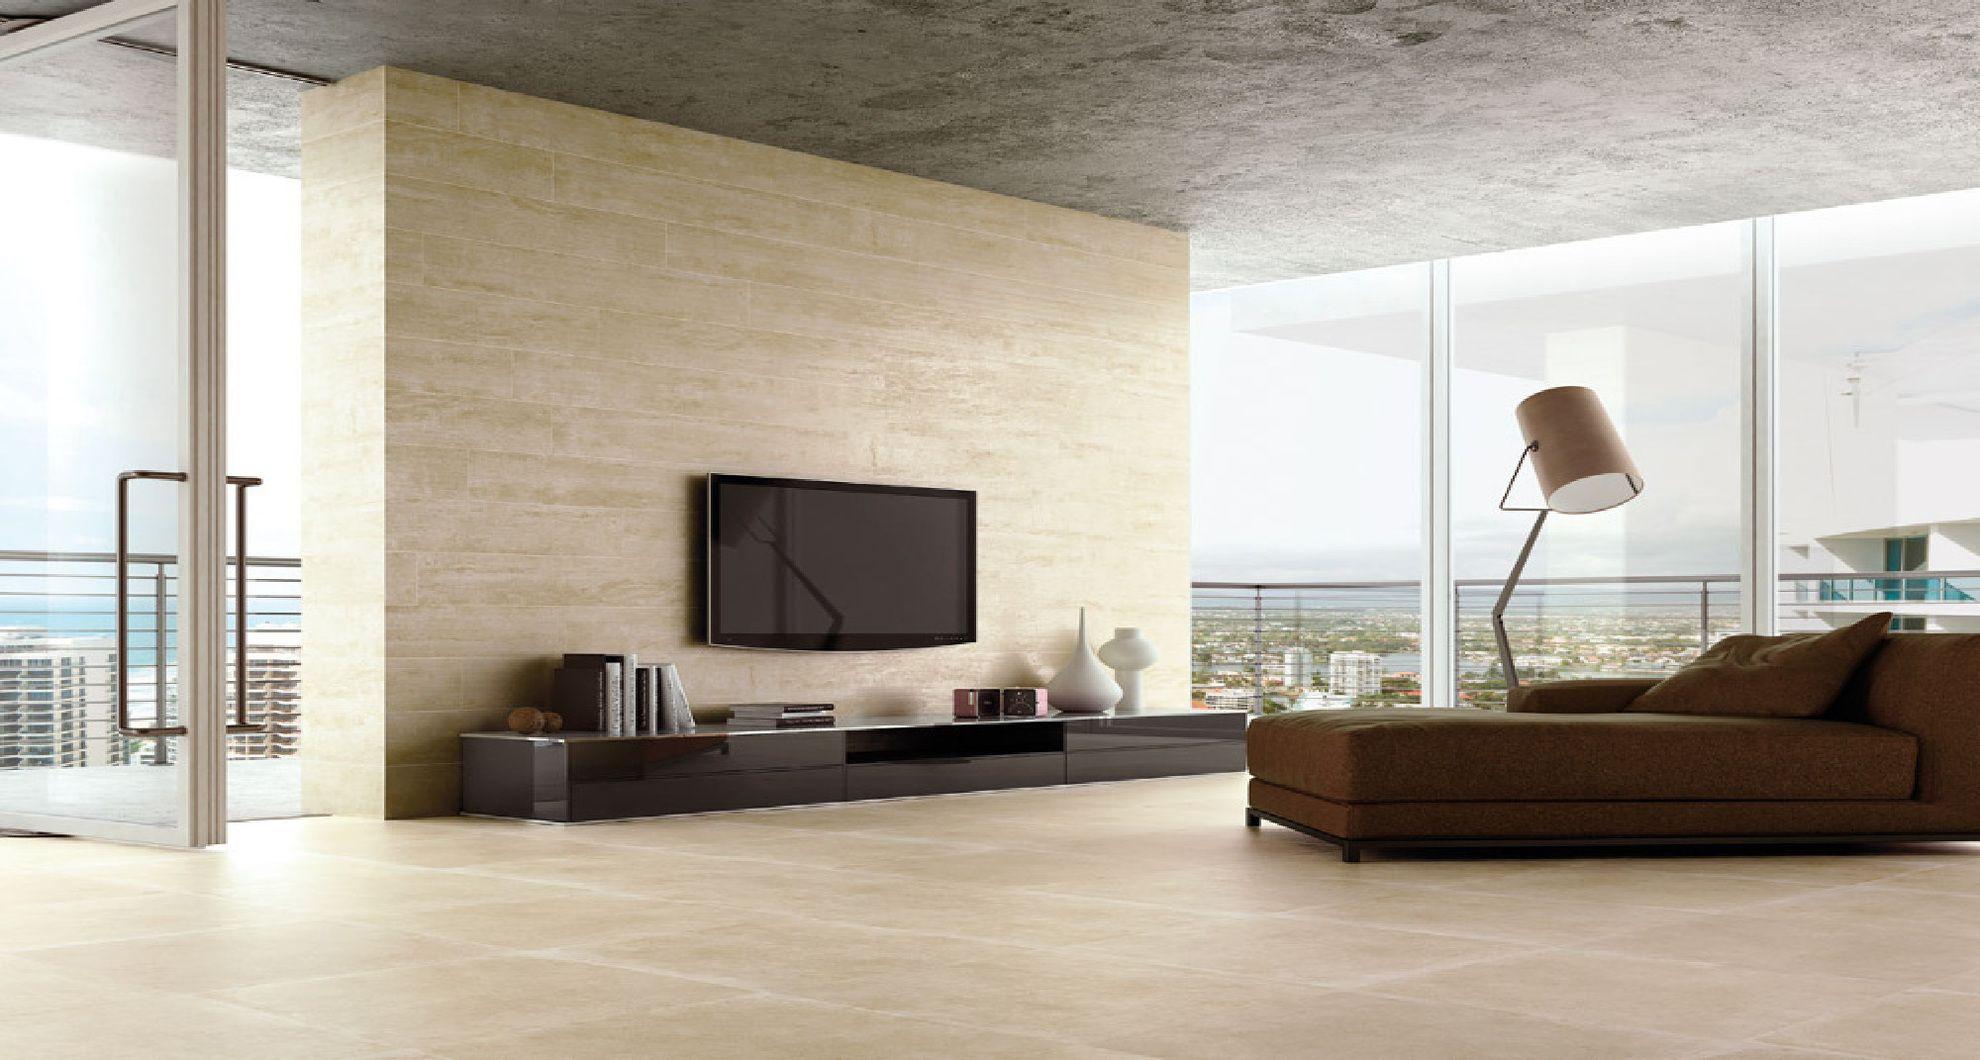 ctm tile tiles porcelain lounge polished floor shiny floors category nano x styles lunar